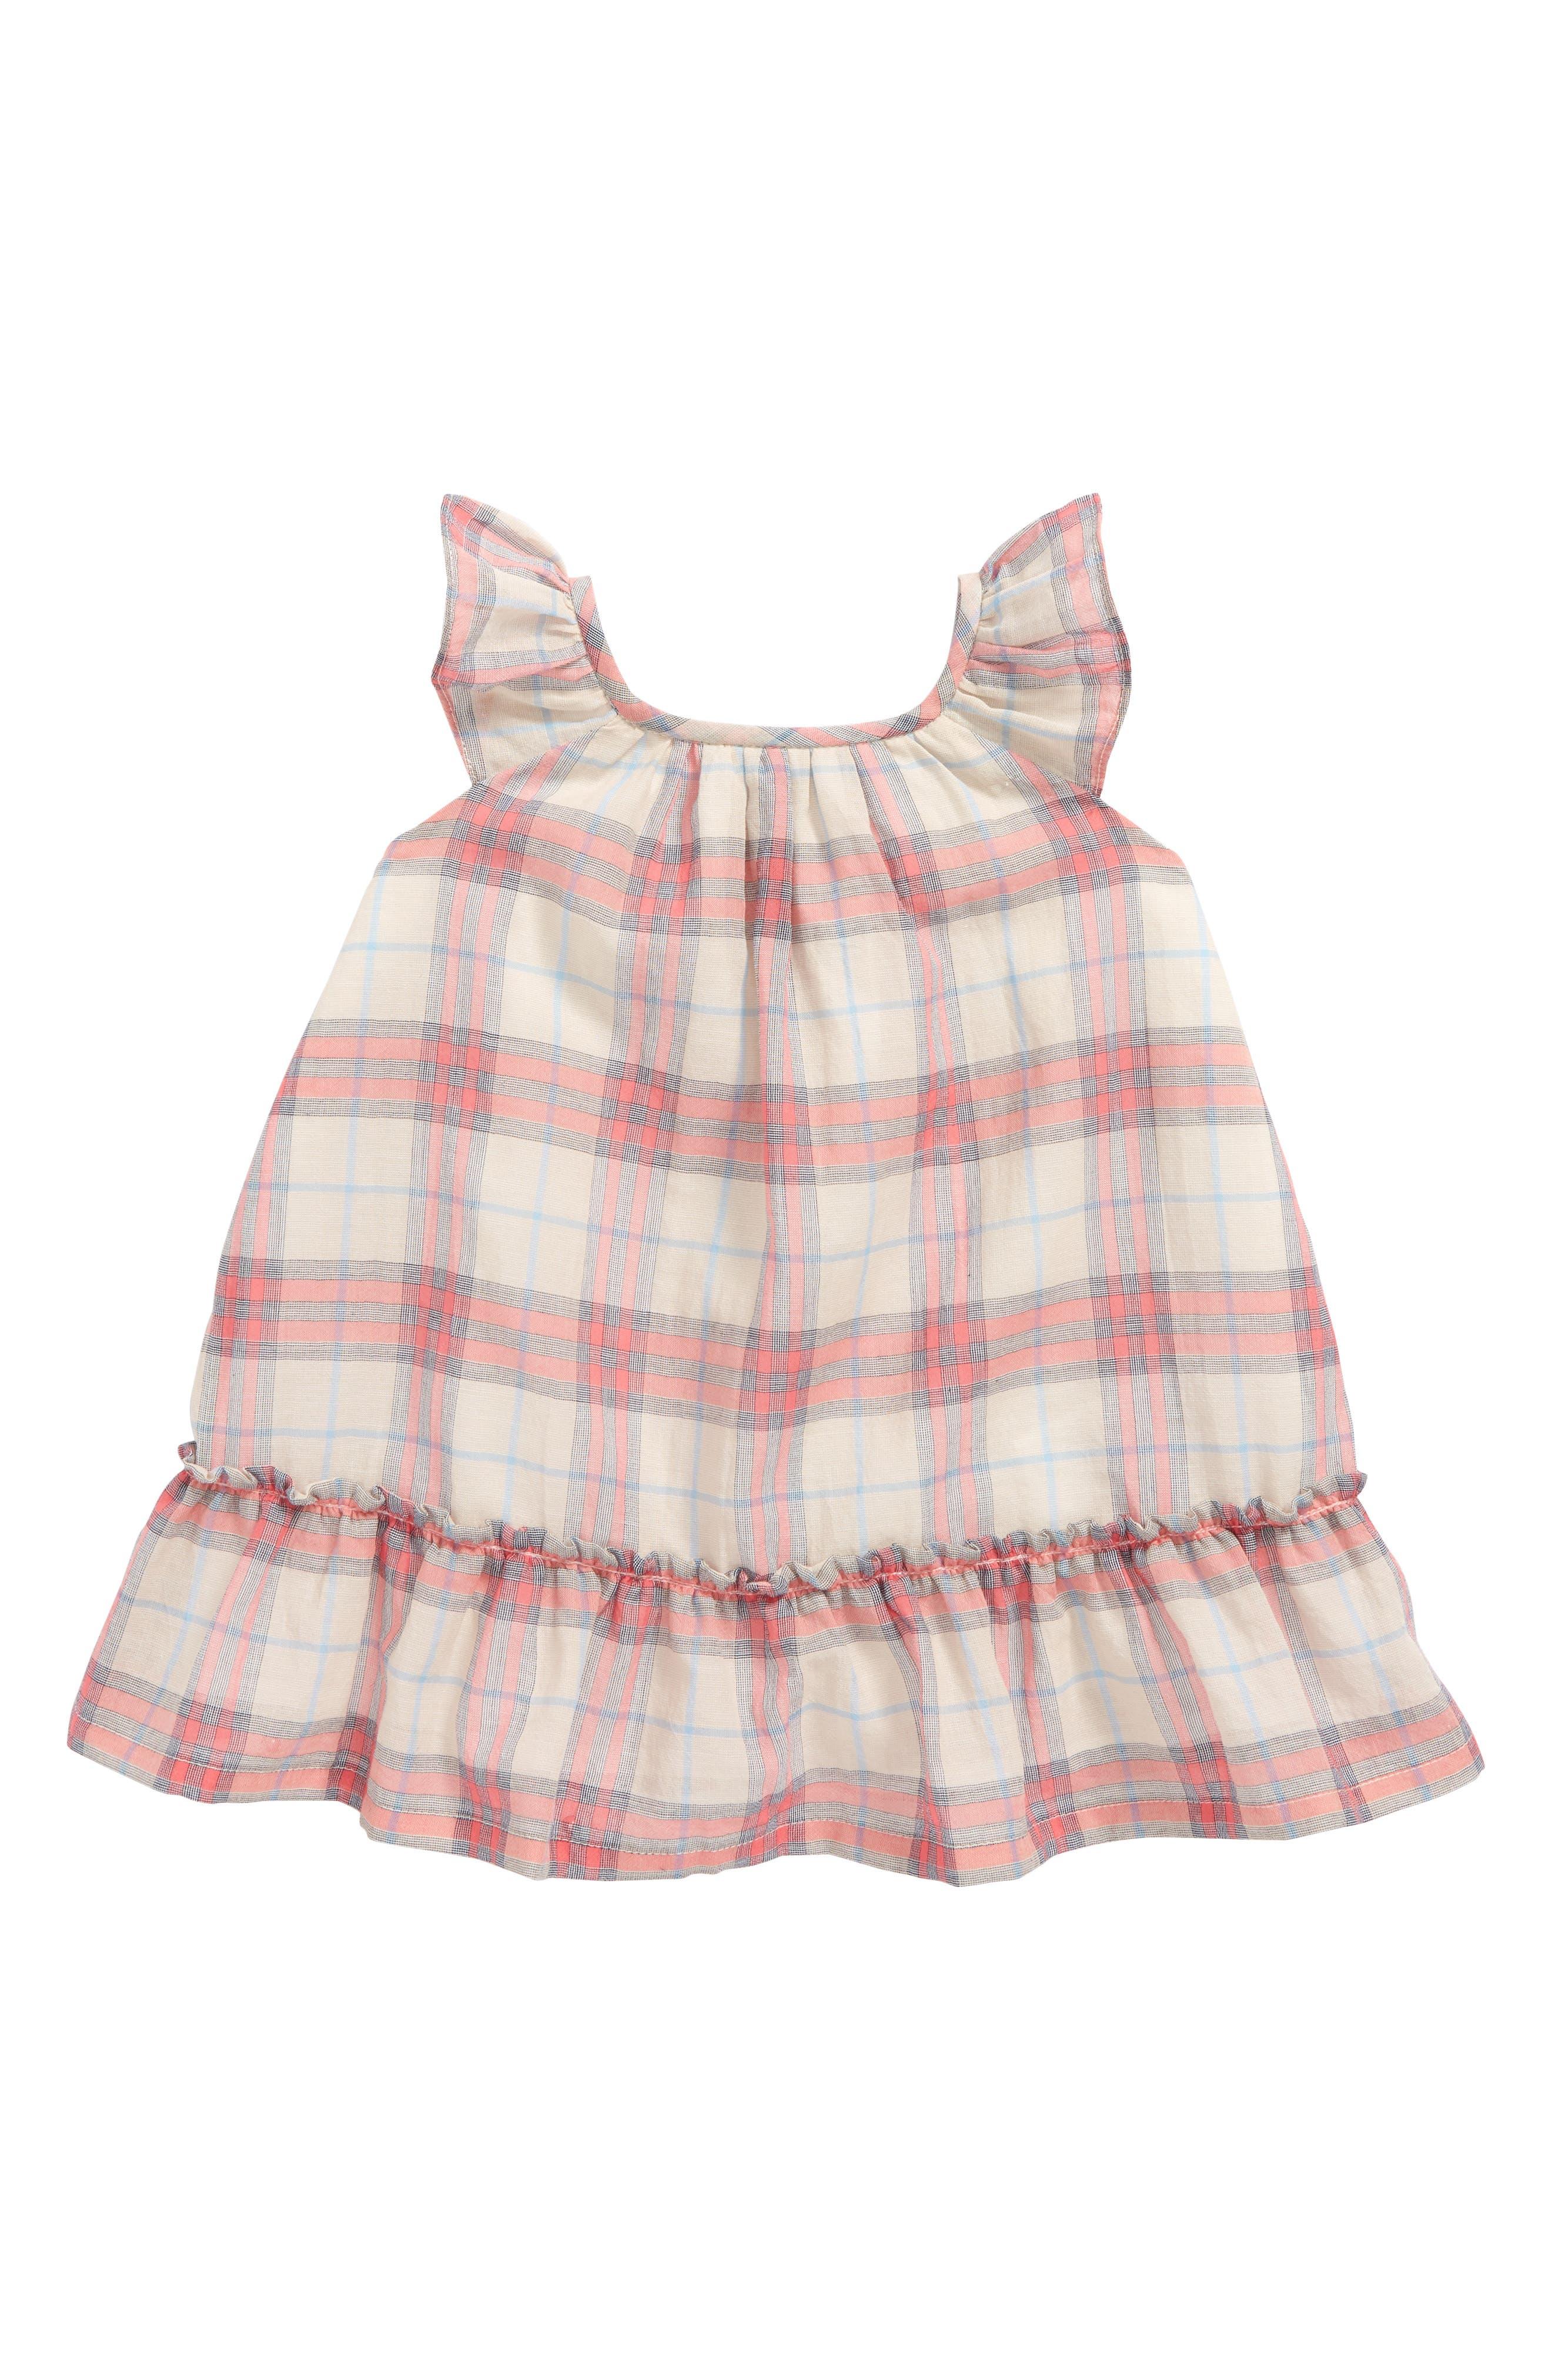 Tania Check Dress,                         Main,                         color, 671